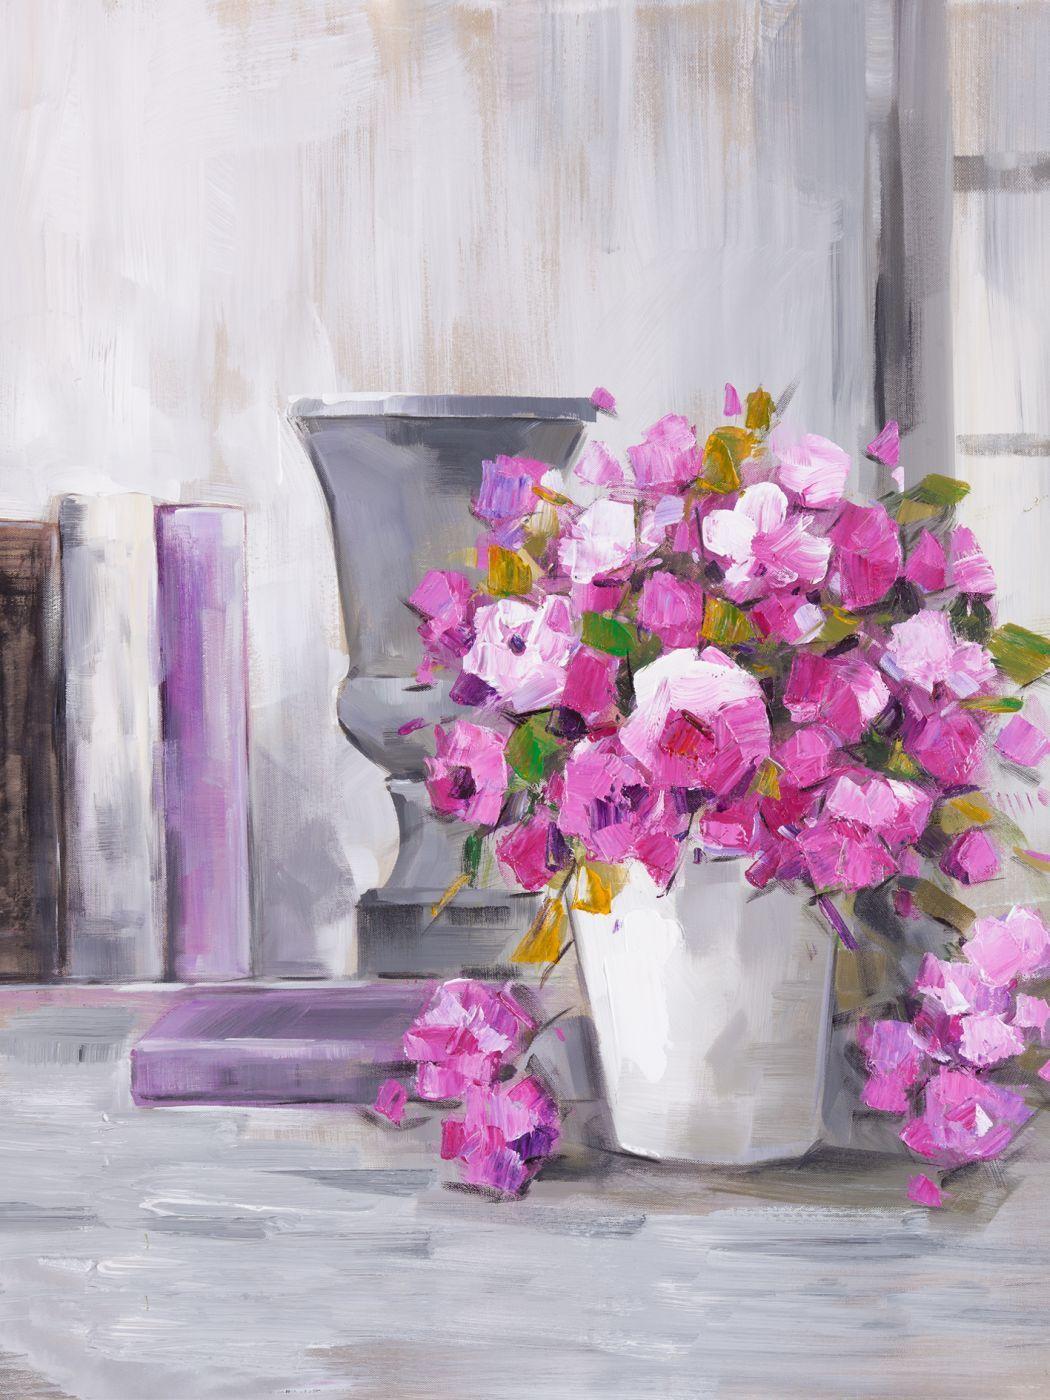 Obraz dekoracyjny aroma kreslenÉ kvĚtiny drawing flowers pinterest